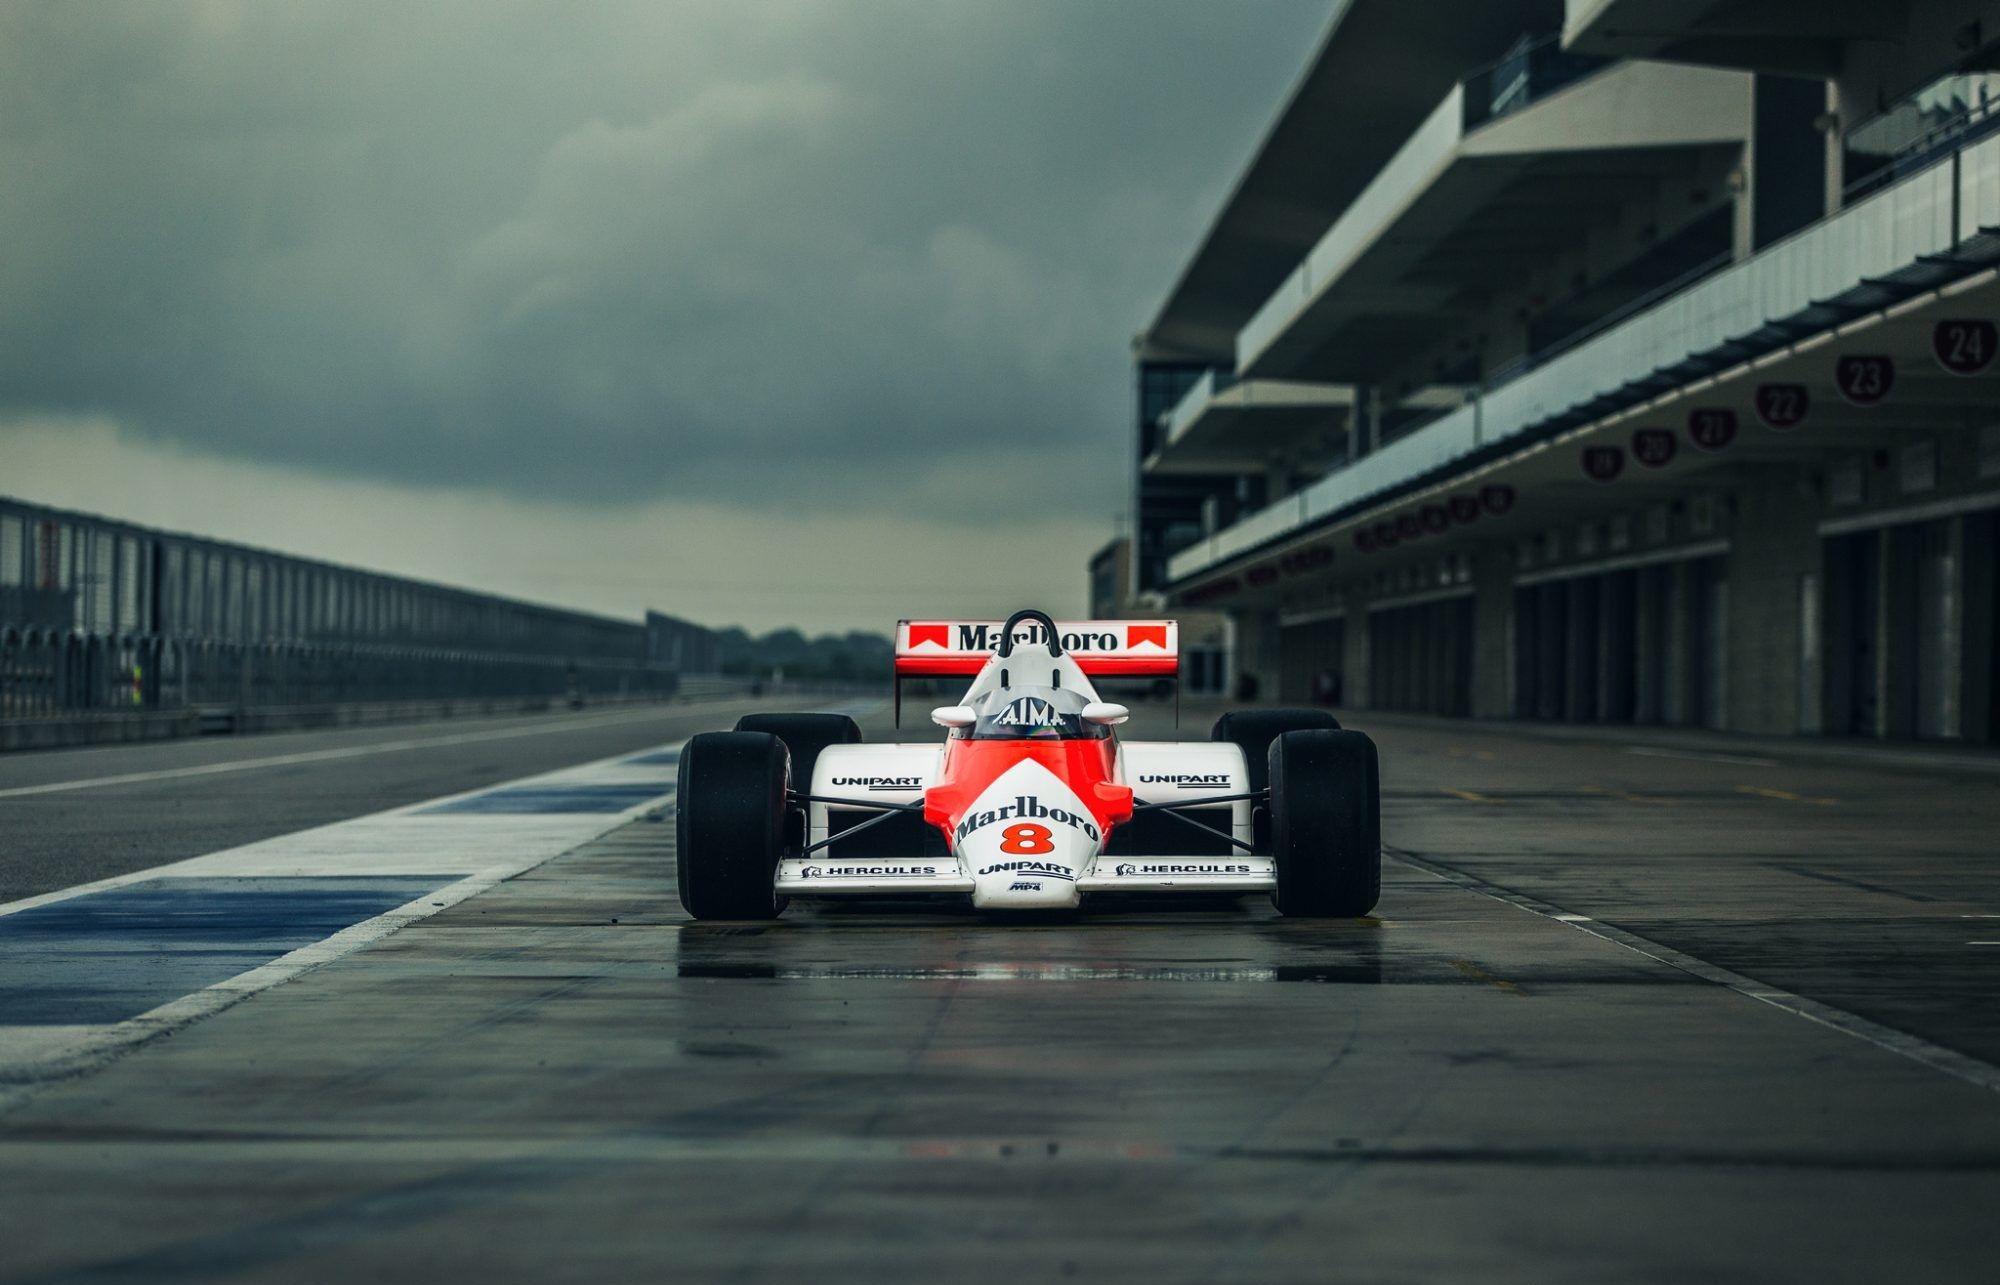 Niki Lauda's Formula 1 McLarens